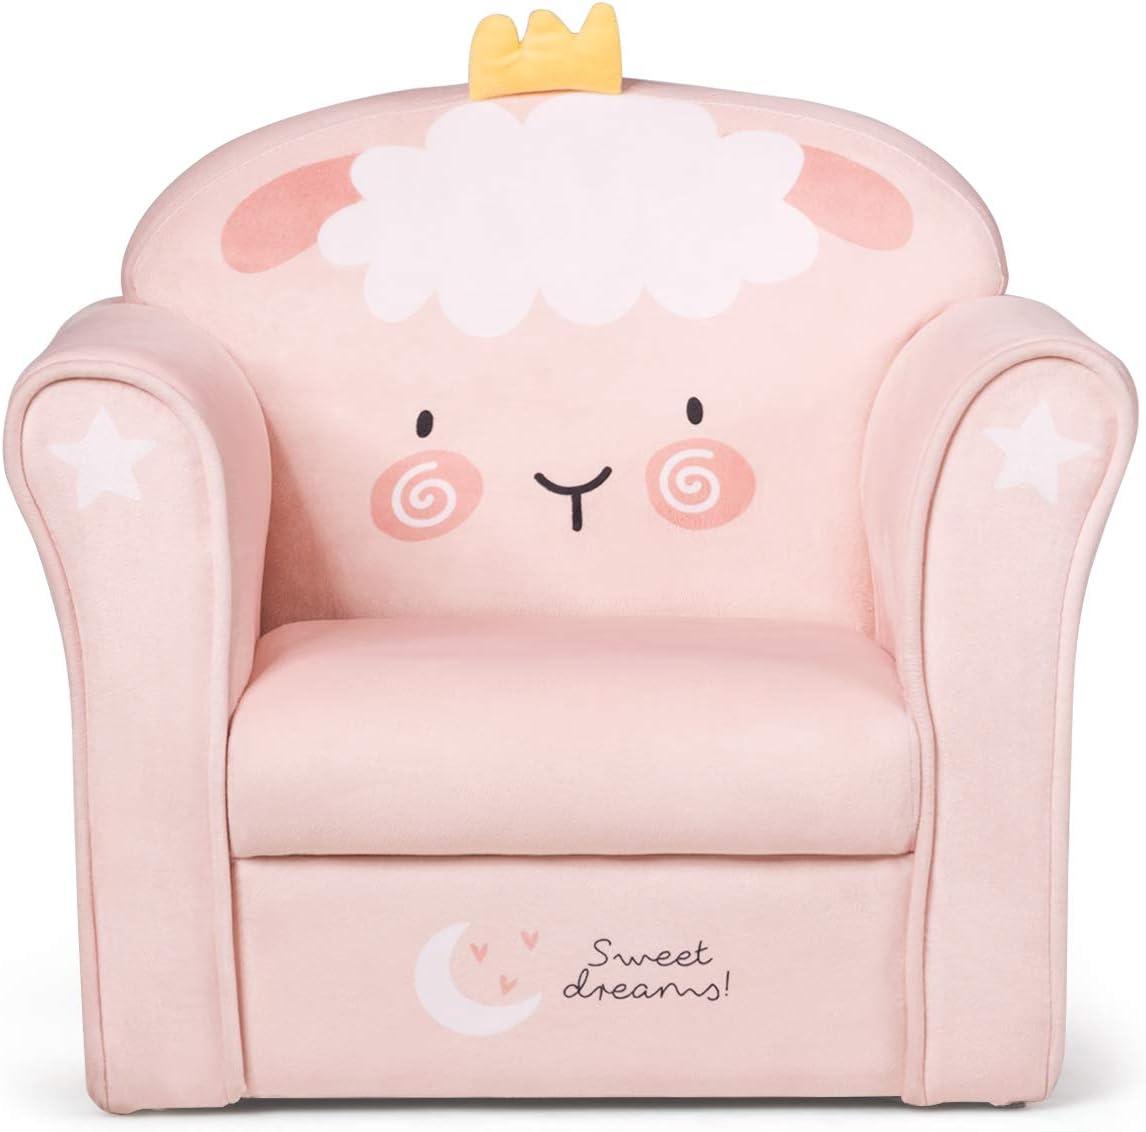 Children Furniture for Baby Boys Girls HONEY JOY Kids Sofa Children Upholstered Armchair w//Sturdy Wooden Construction Colorful Elephant Toddler Armrest Couch for Living Room /& Bedroom